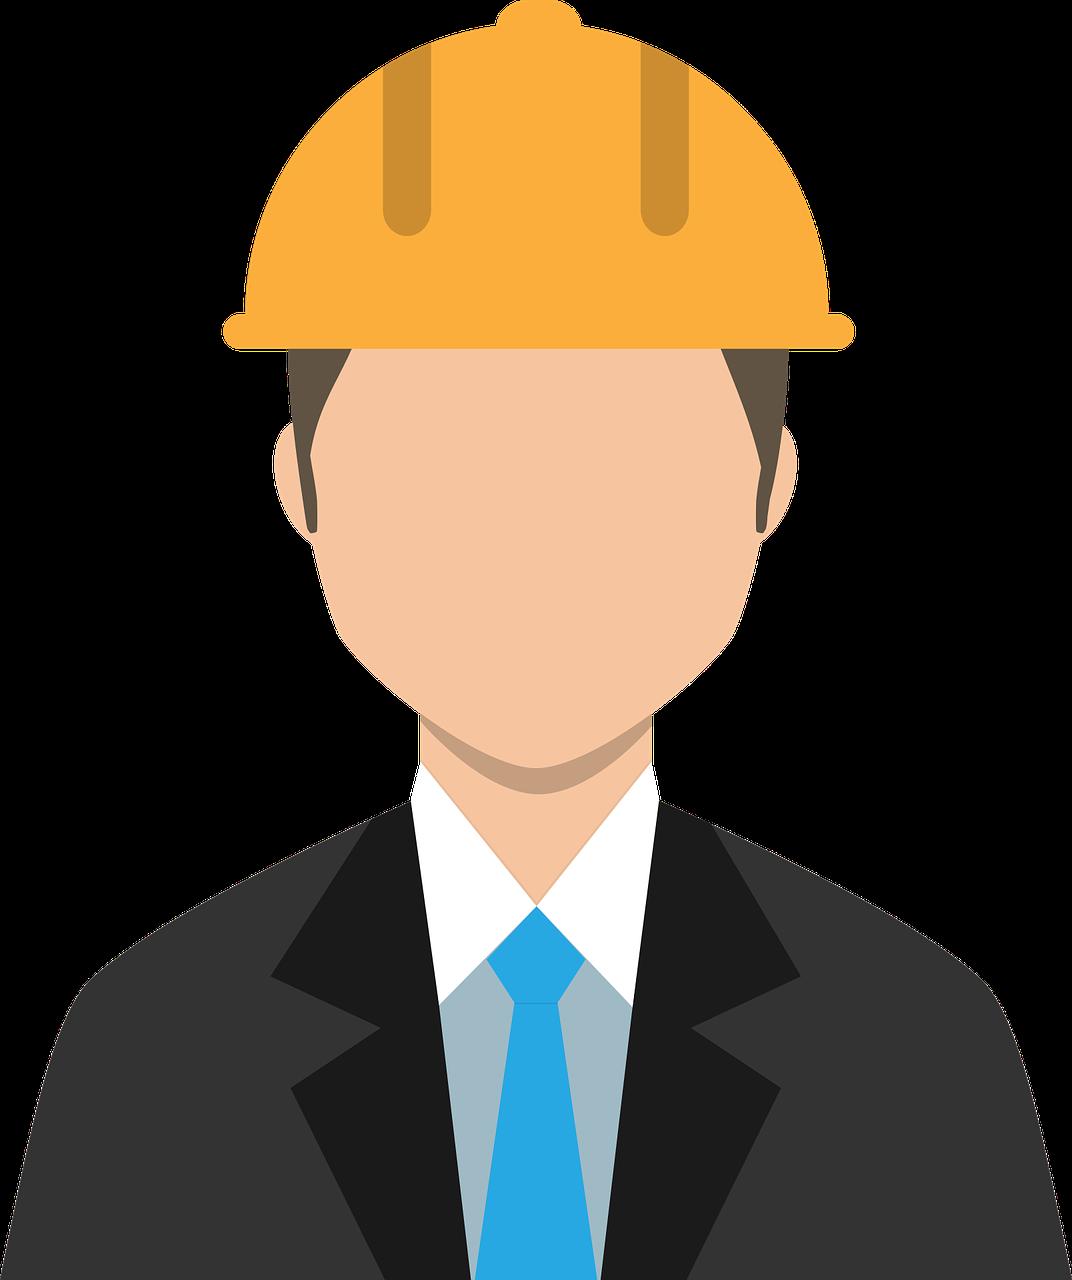 Contractor clipart construction zone. Shawna llc czadmin testimonials